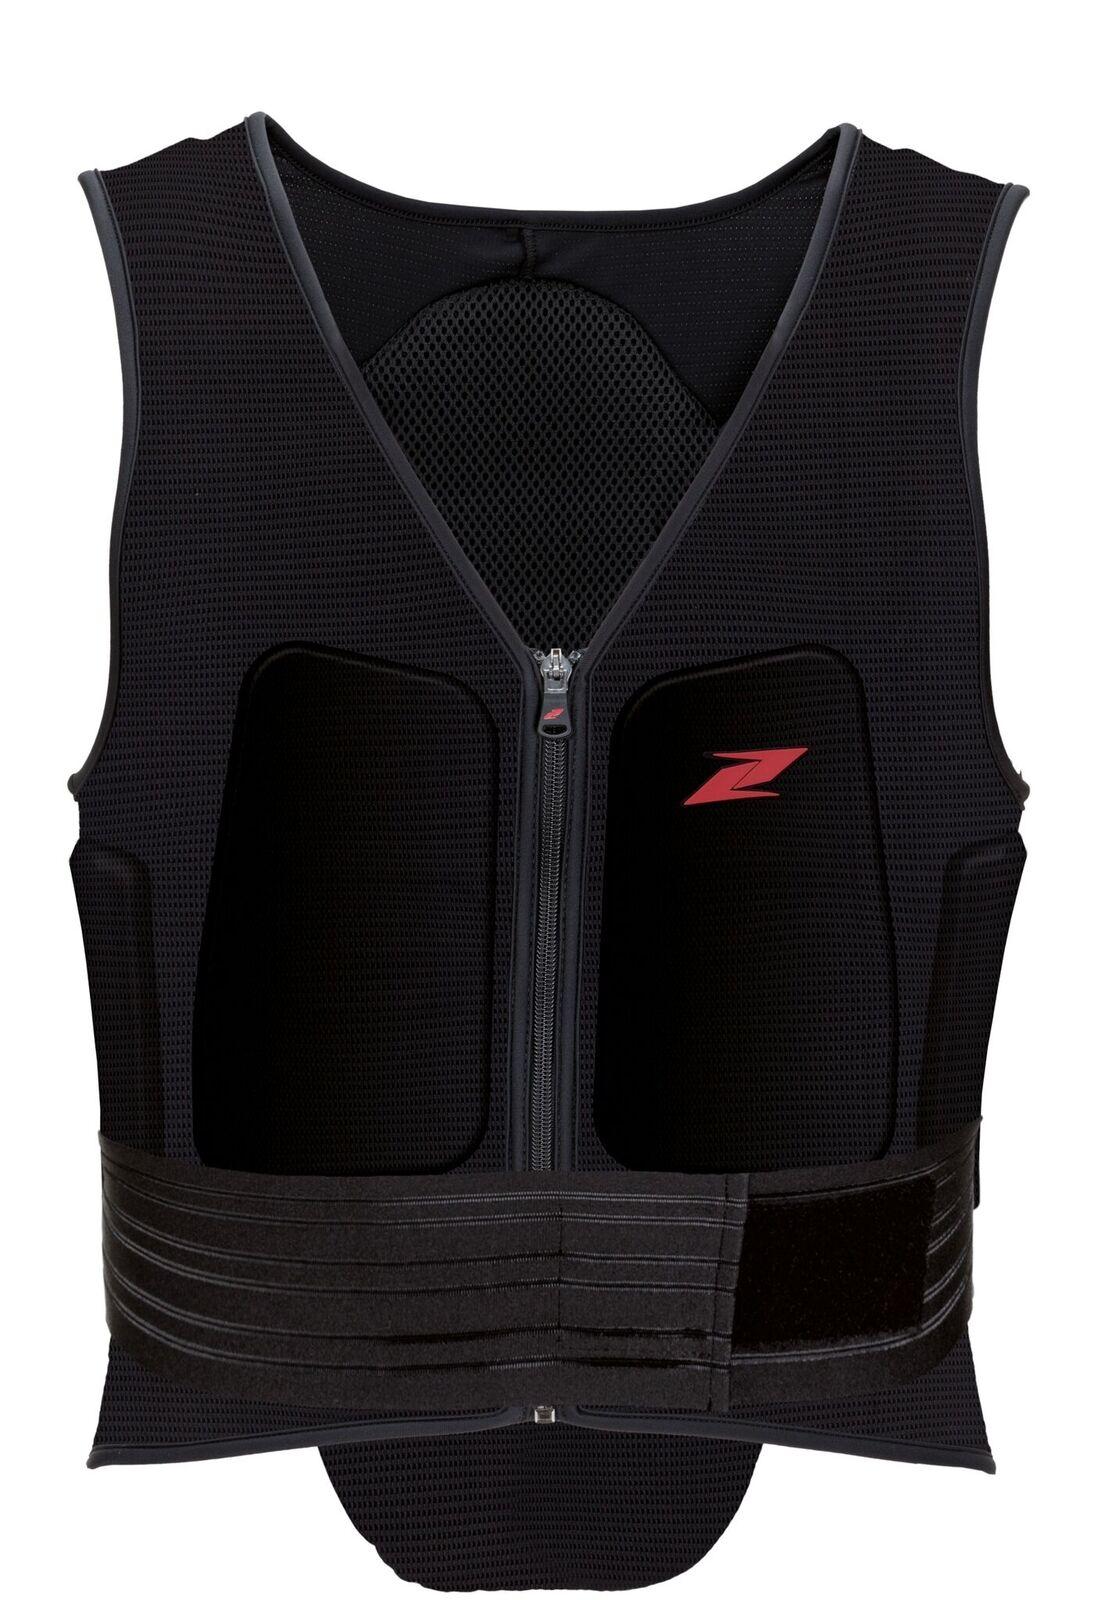 ZANDONA Soft Active ProX7 Vest ProX7 Active Schutzweste 168-177 cm Körpergröße 60fd2f